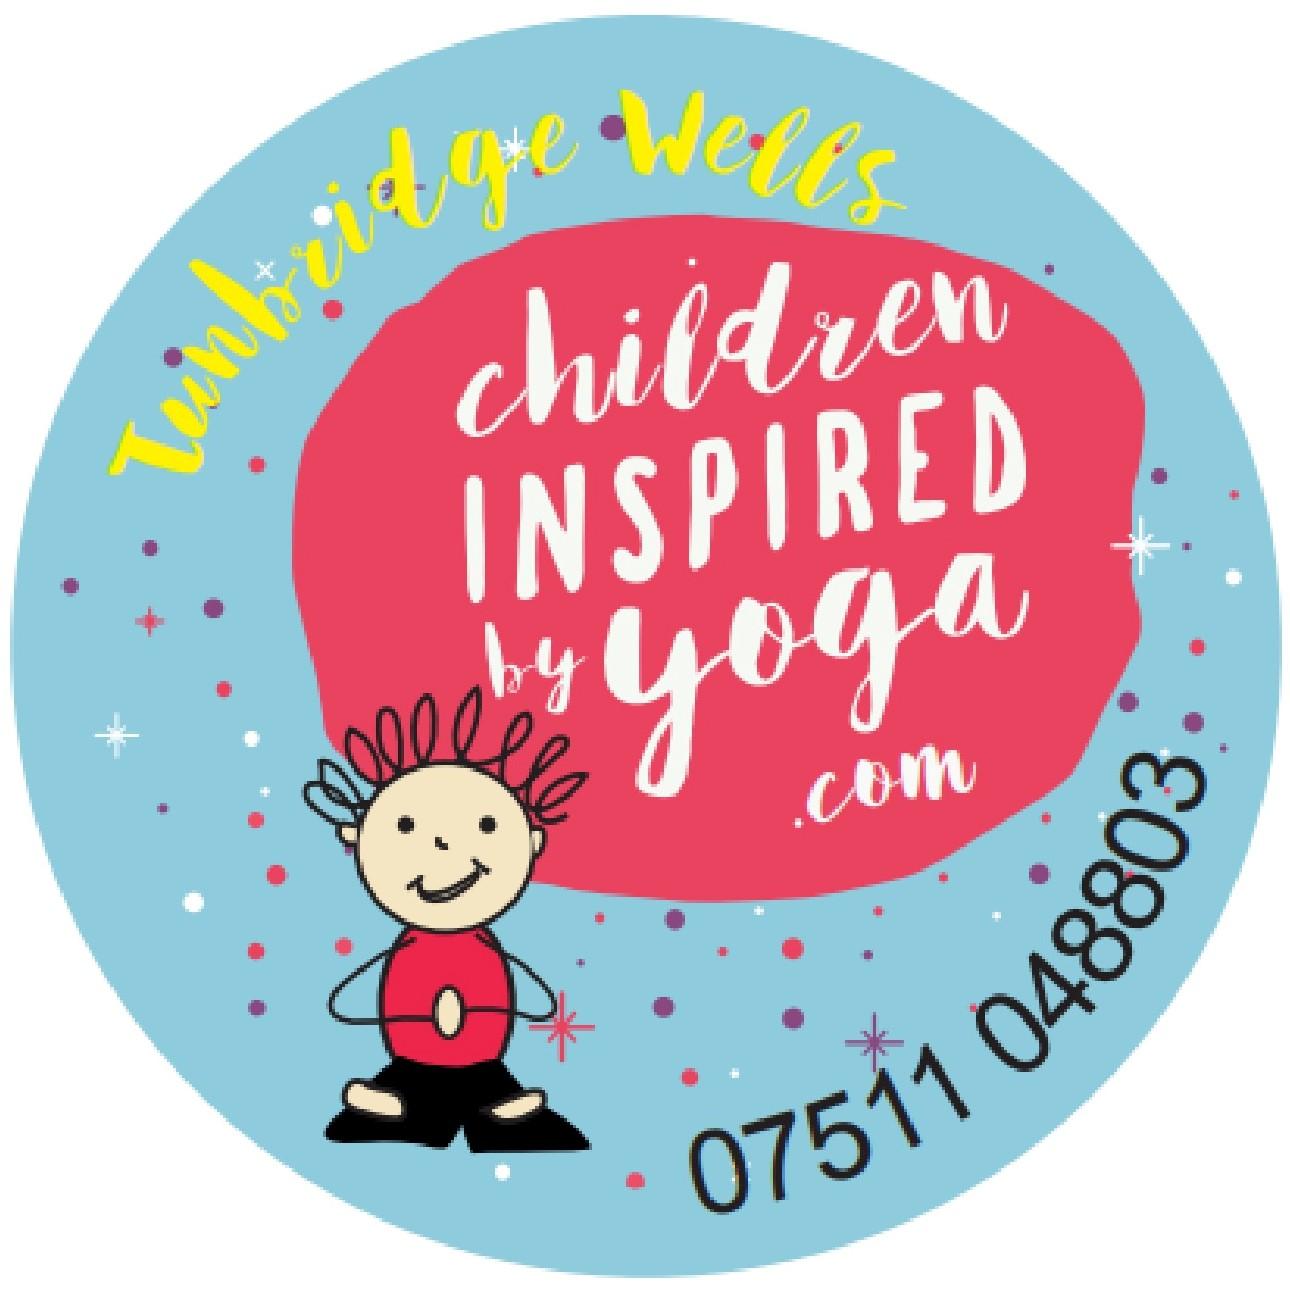 Children Inspired by Yoga (Tunbridge Wells)'s logo